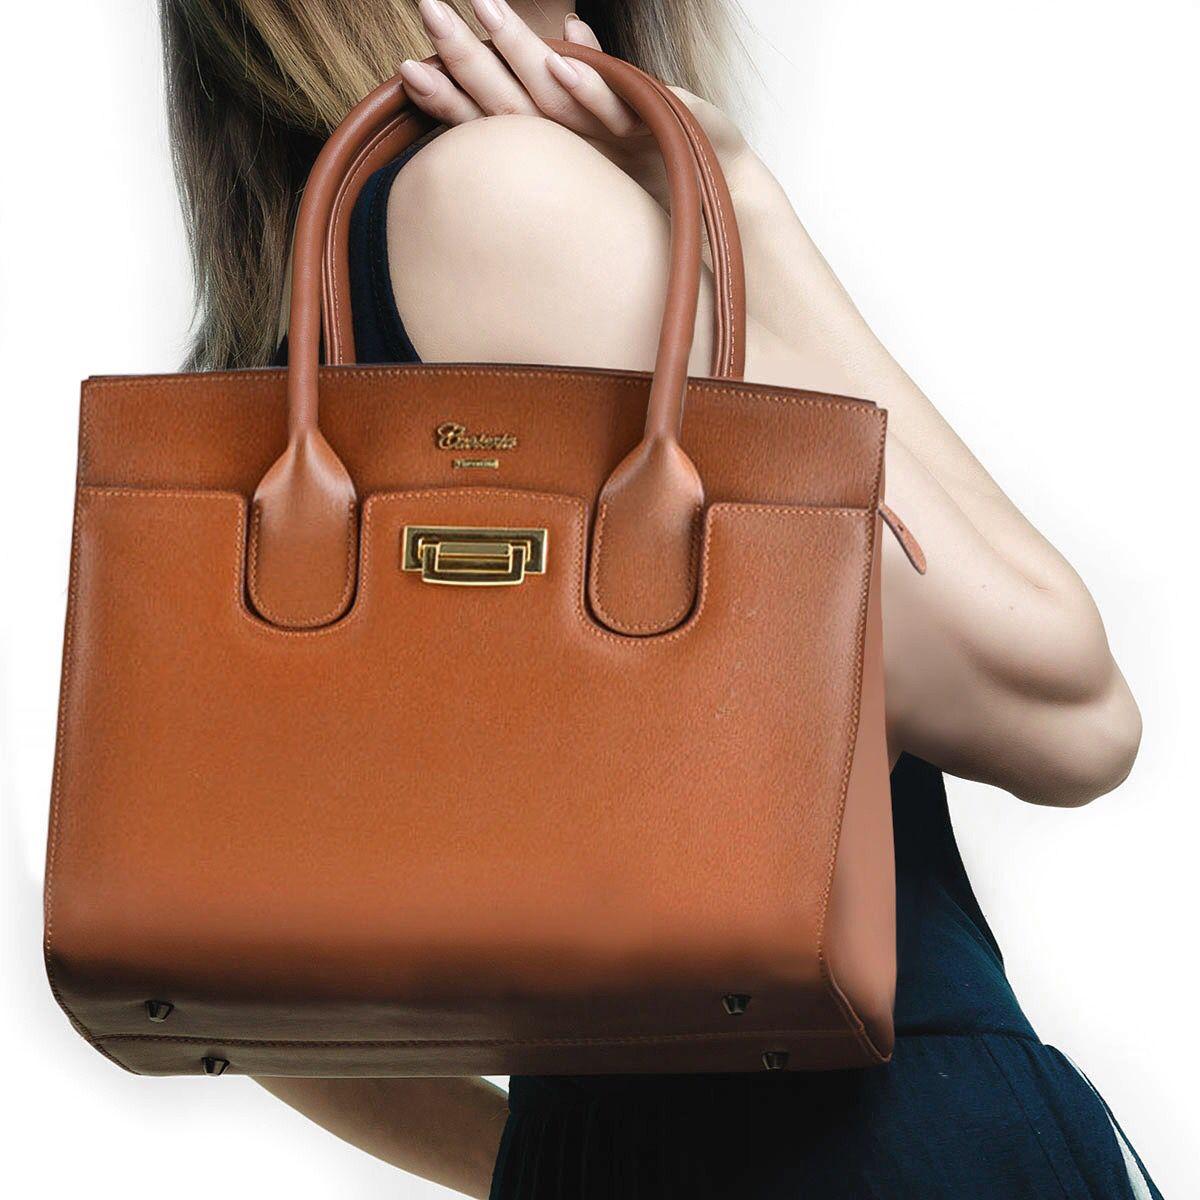 The New Season Aurora Handbag Genuine Italian Saffiano Leather Available In Black Cognac And Red Online At Avalina Free Shipping Australia